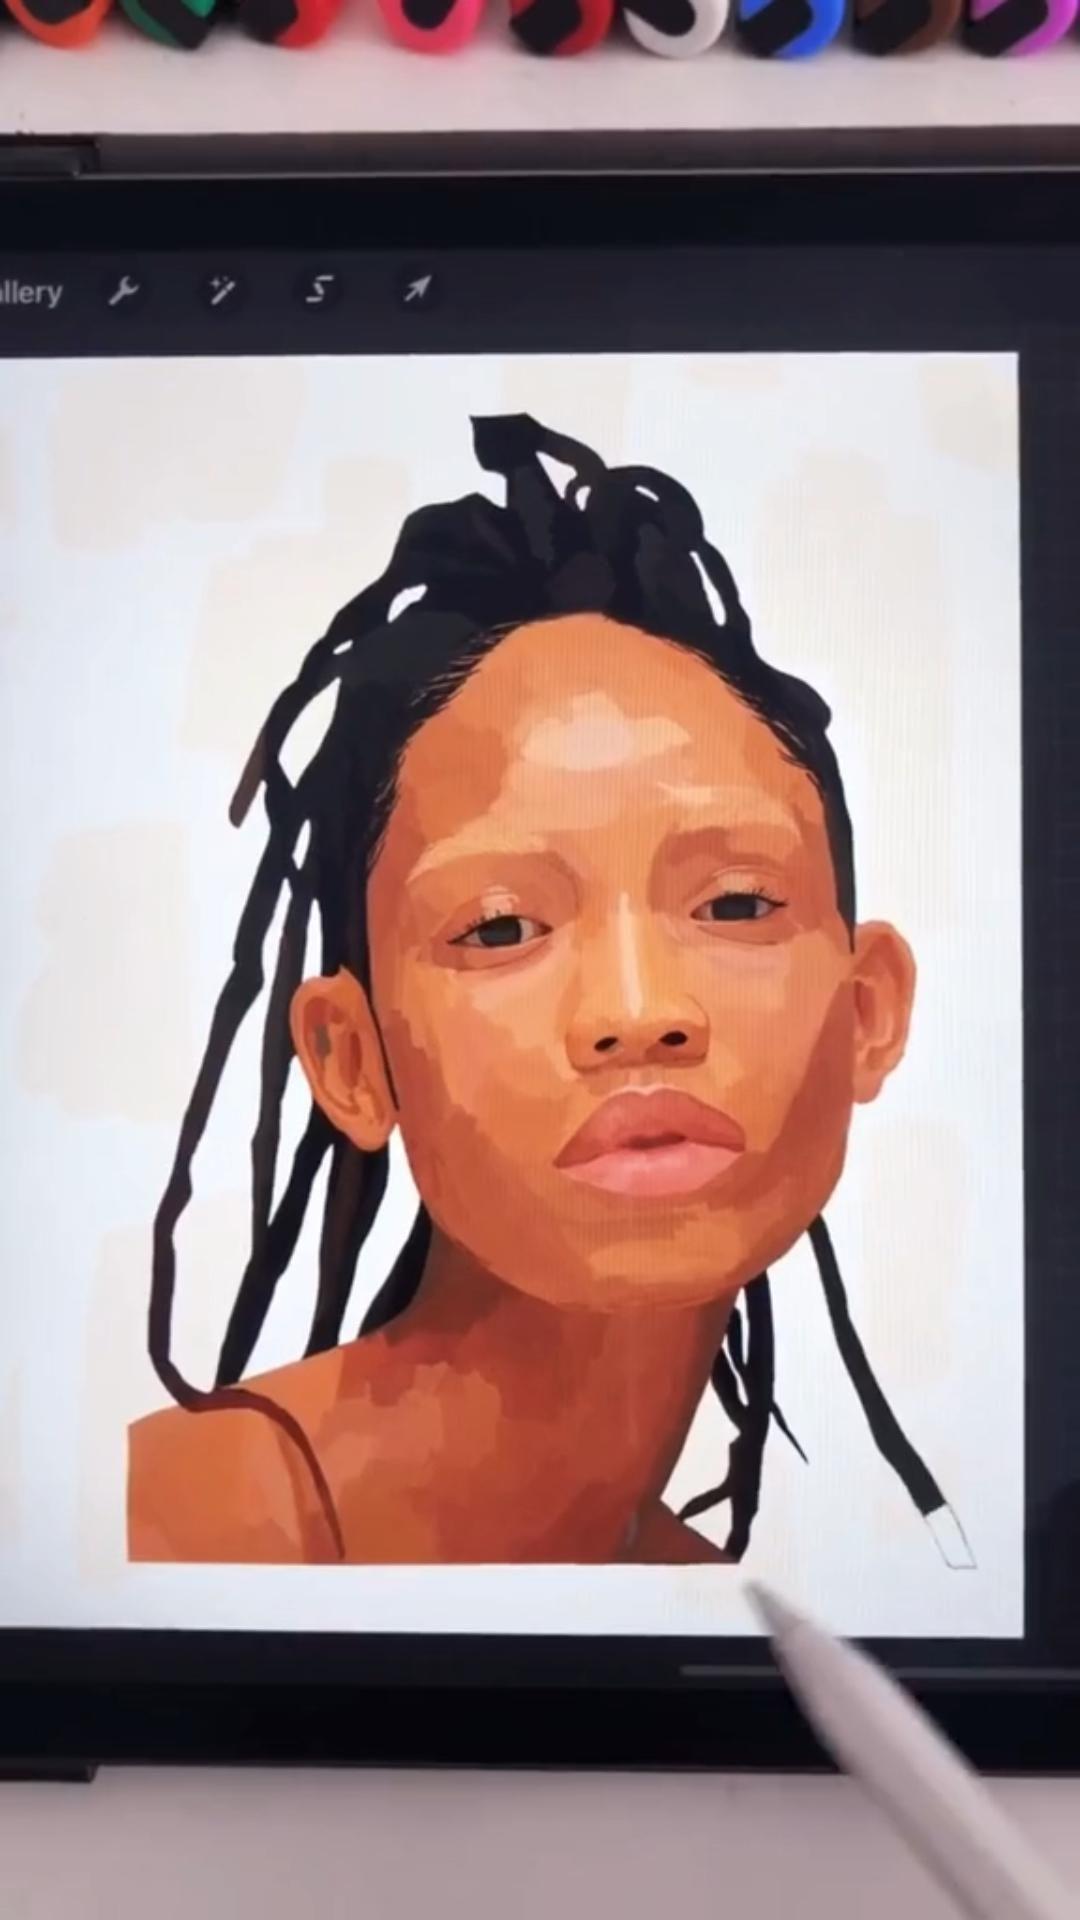 @shivsarts Digital Portrait Art Illustration of a Model on Procreate! Character Design Art Tutorial